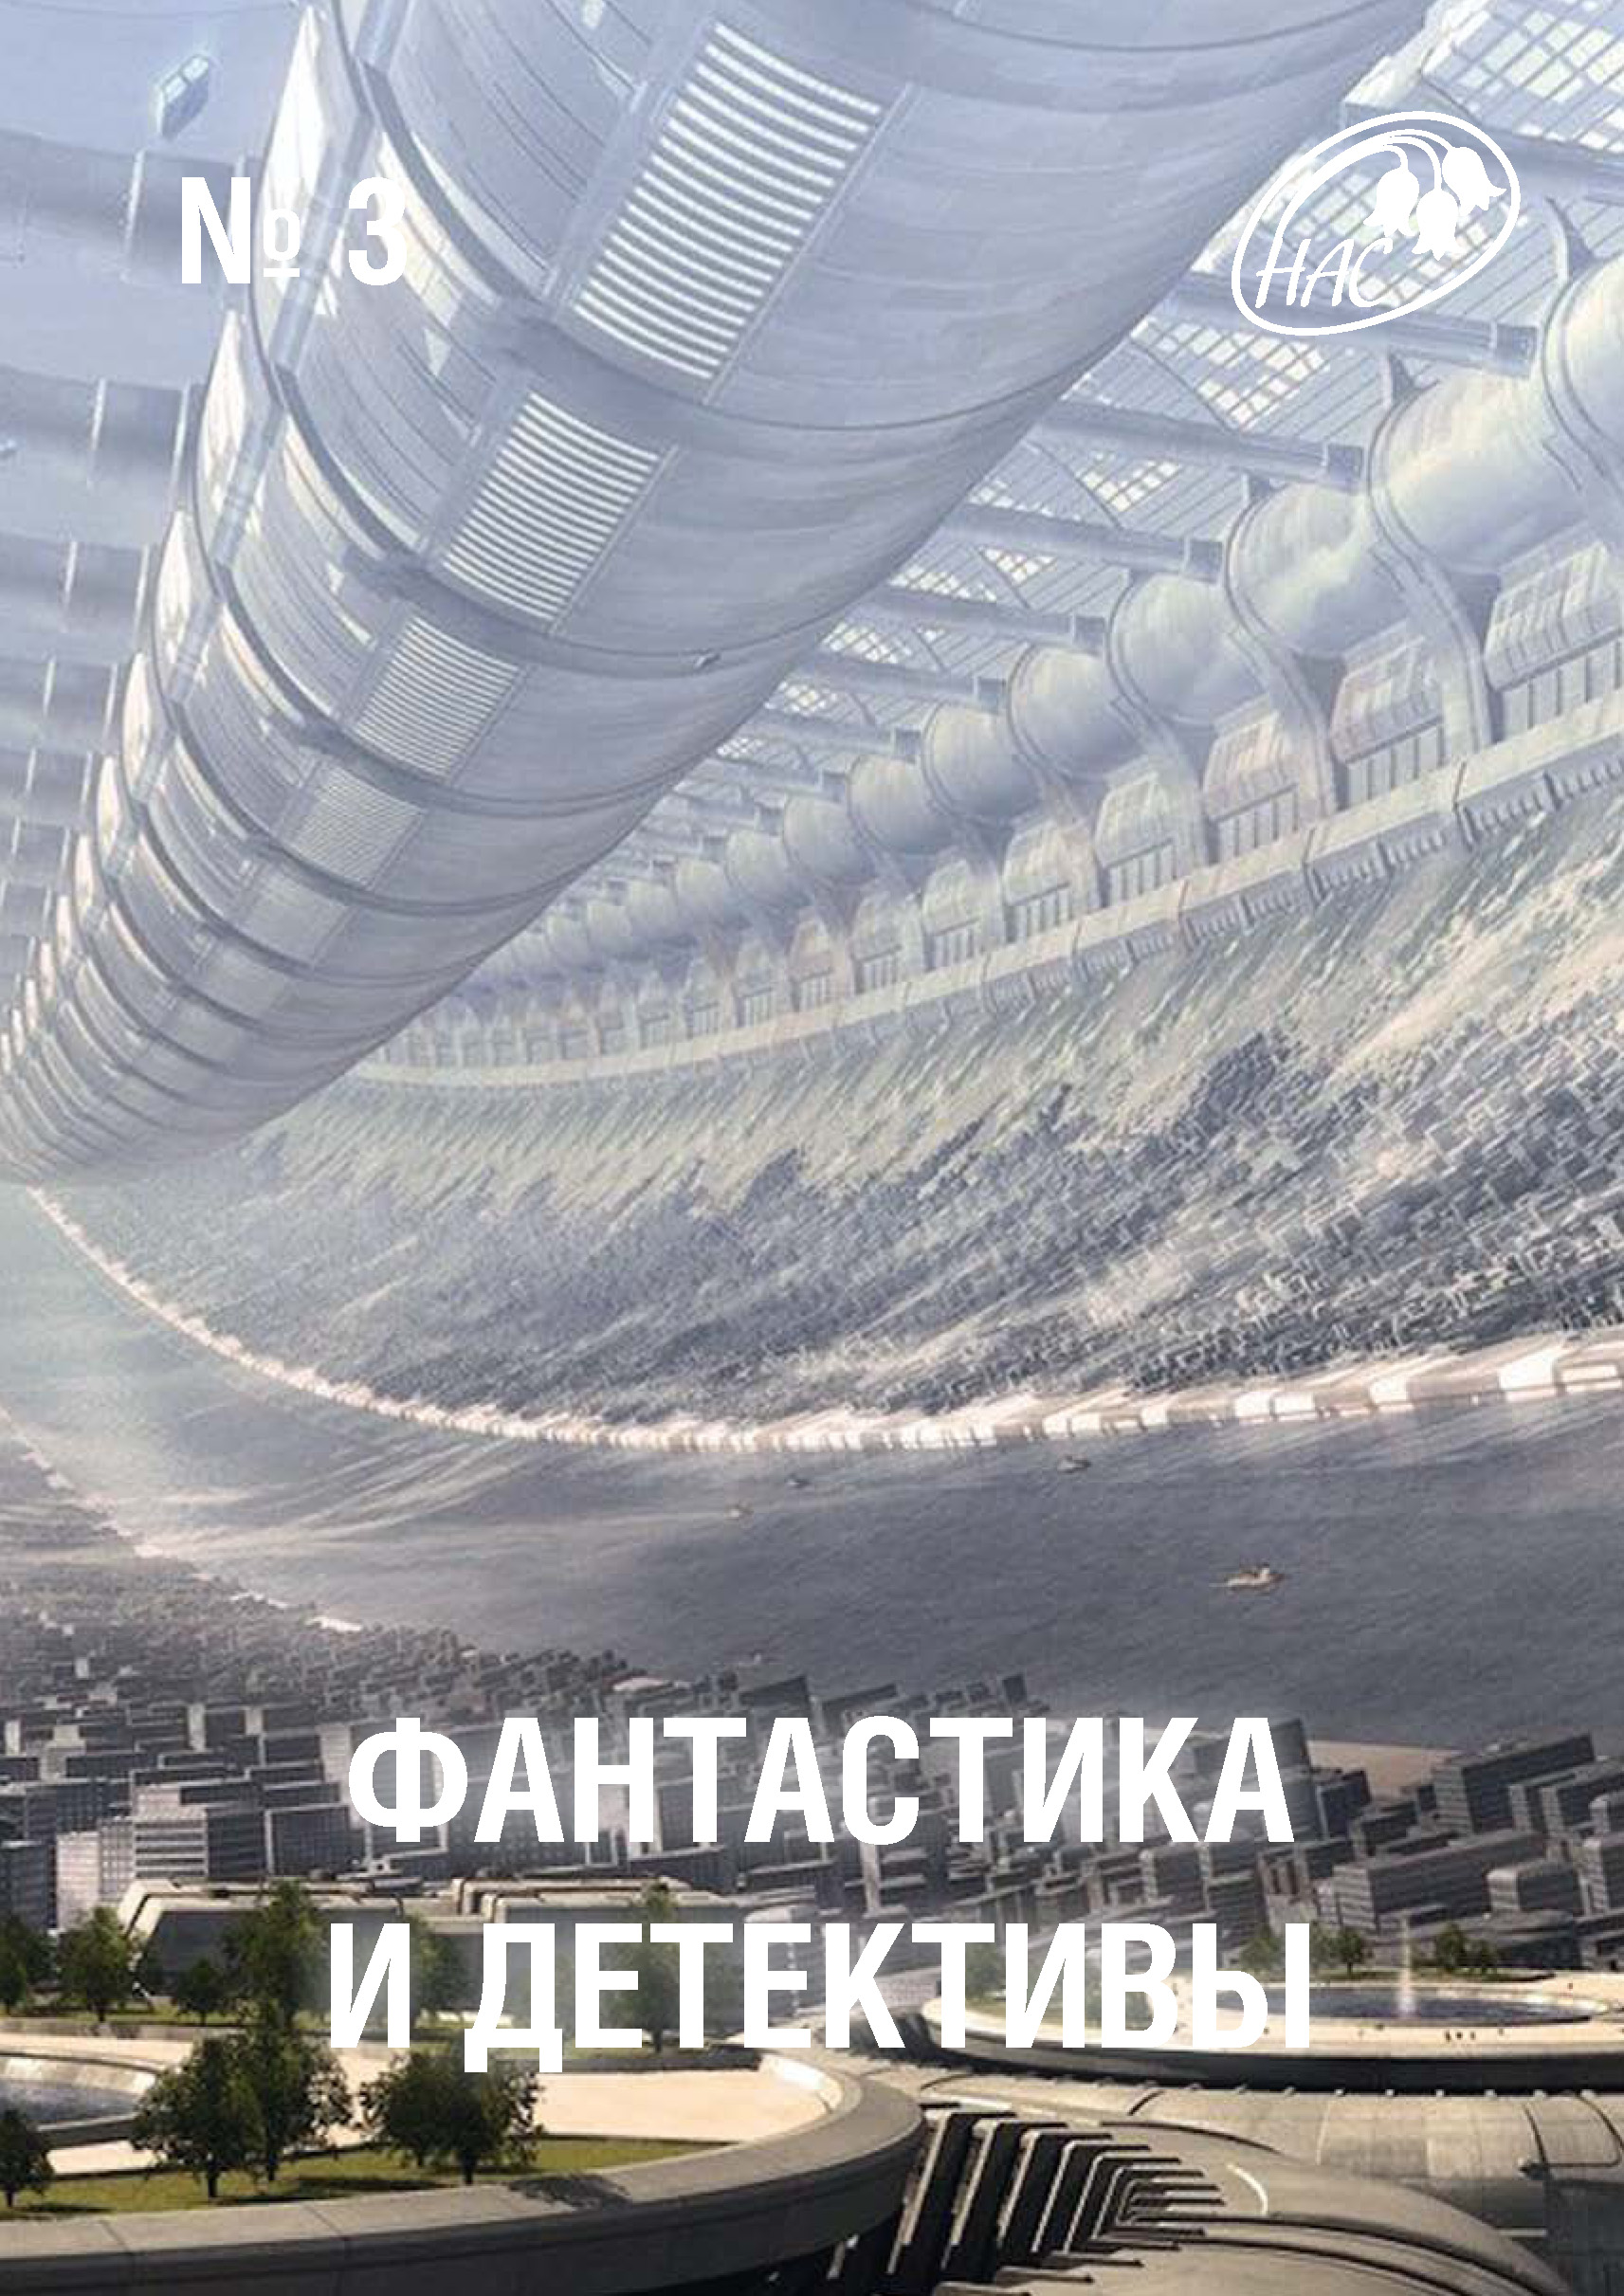 Сборник Журнал «Фантастика и Детективы» №3 сборник журнал фантастика и детективы 5